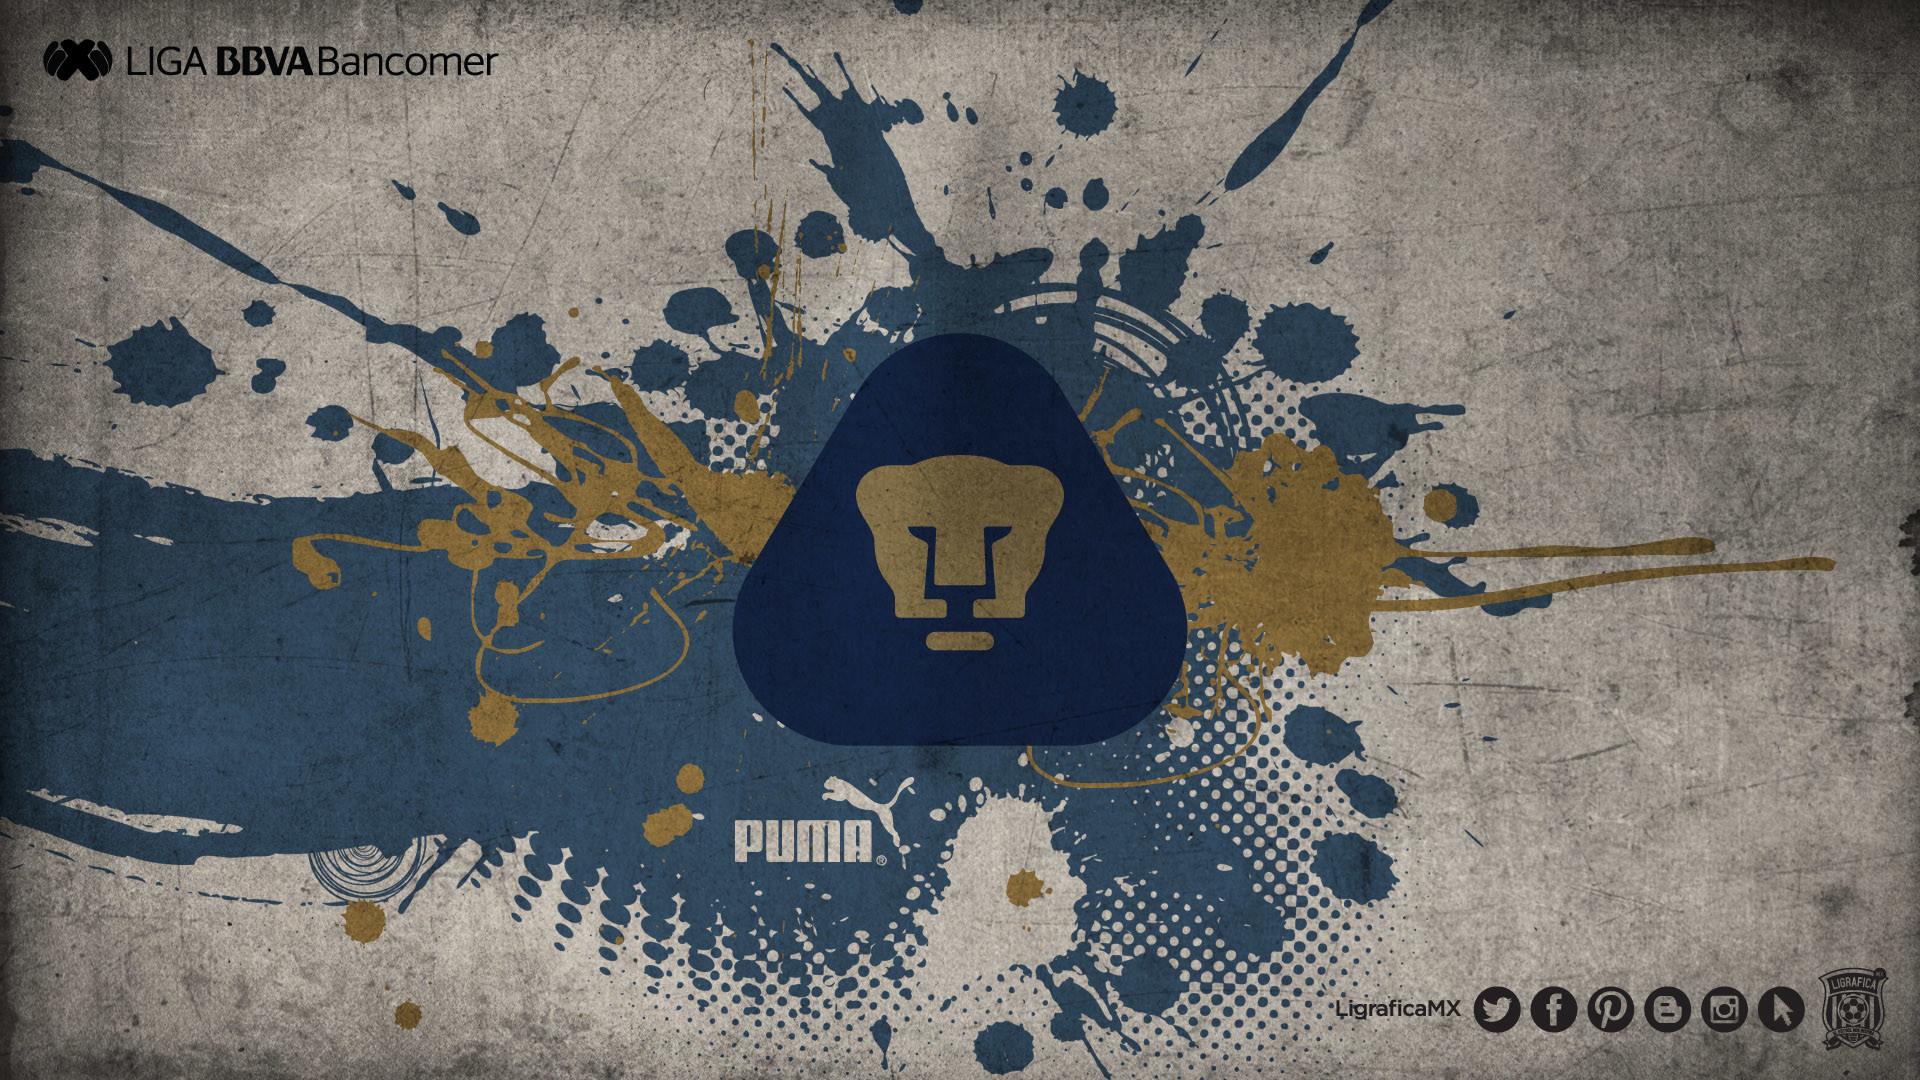 Pumas UNAM • LigraficaMX • 280214CTG(1) | pumas wallpaper | Pinterest |  Pumas